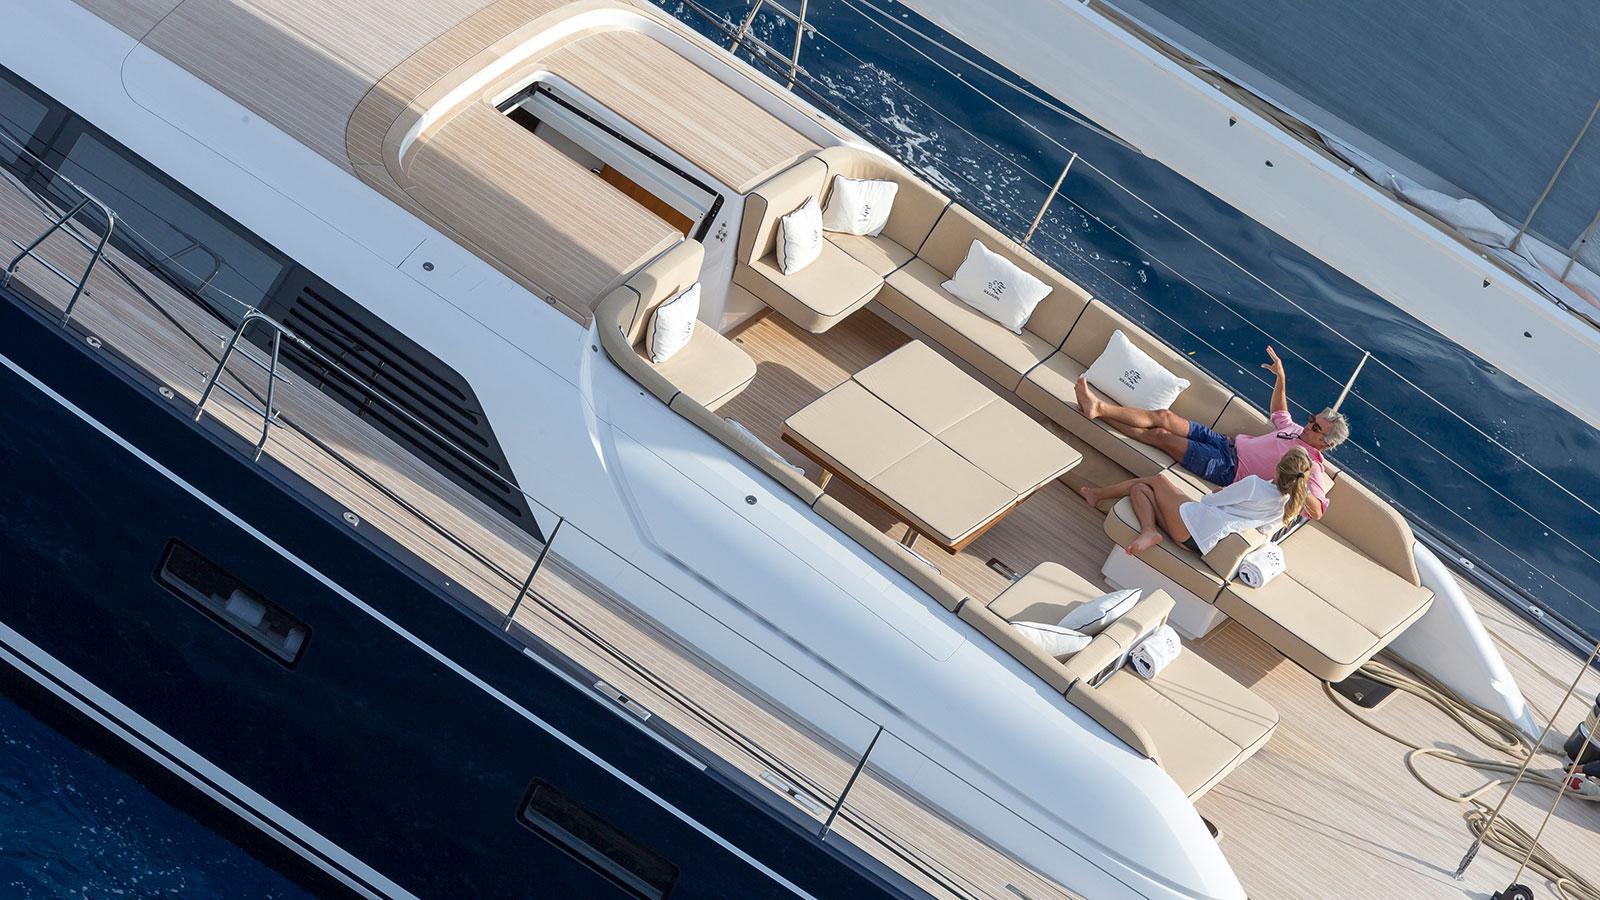 solleone-motor-yacht-nautors-swan-115-s-2015-35m-cockpit